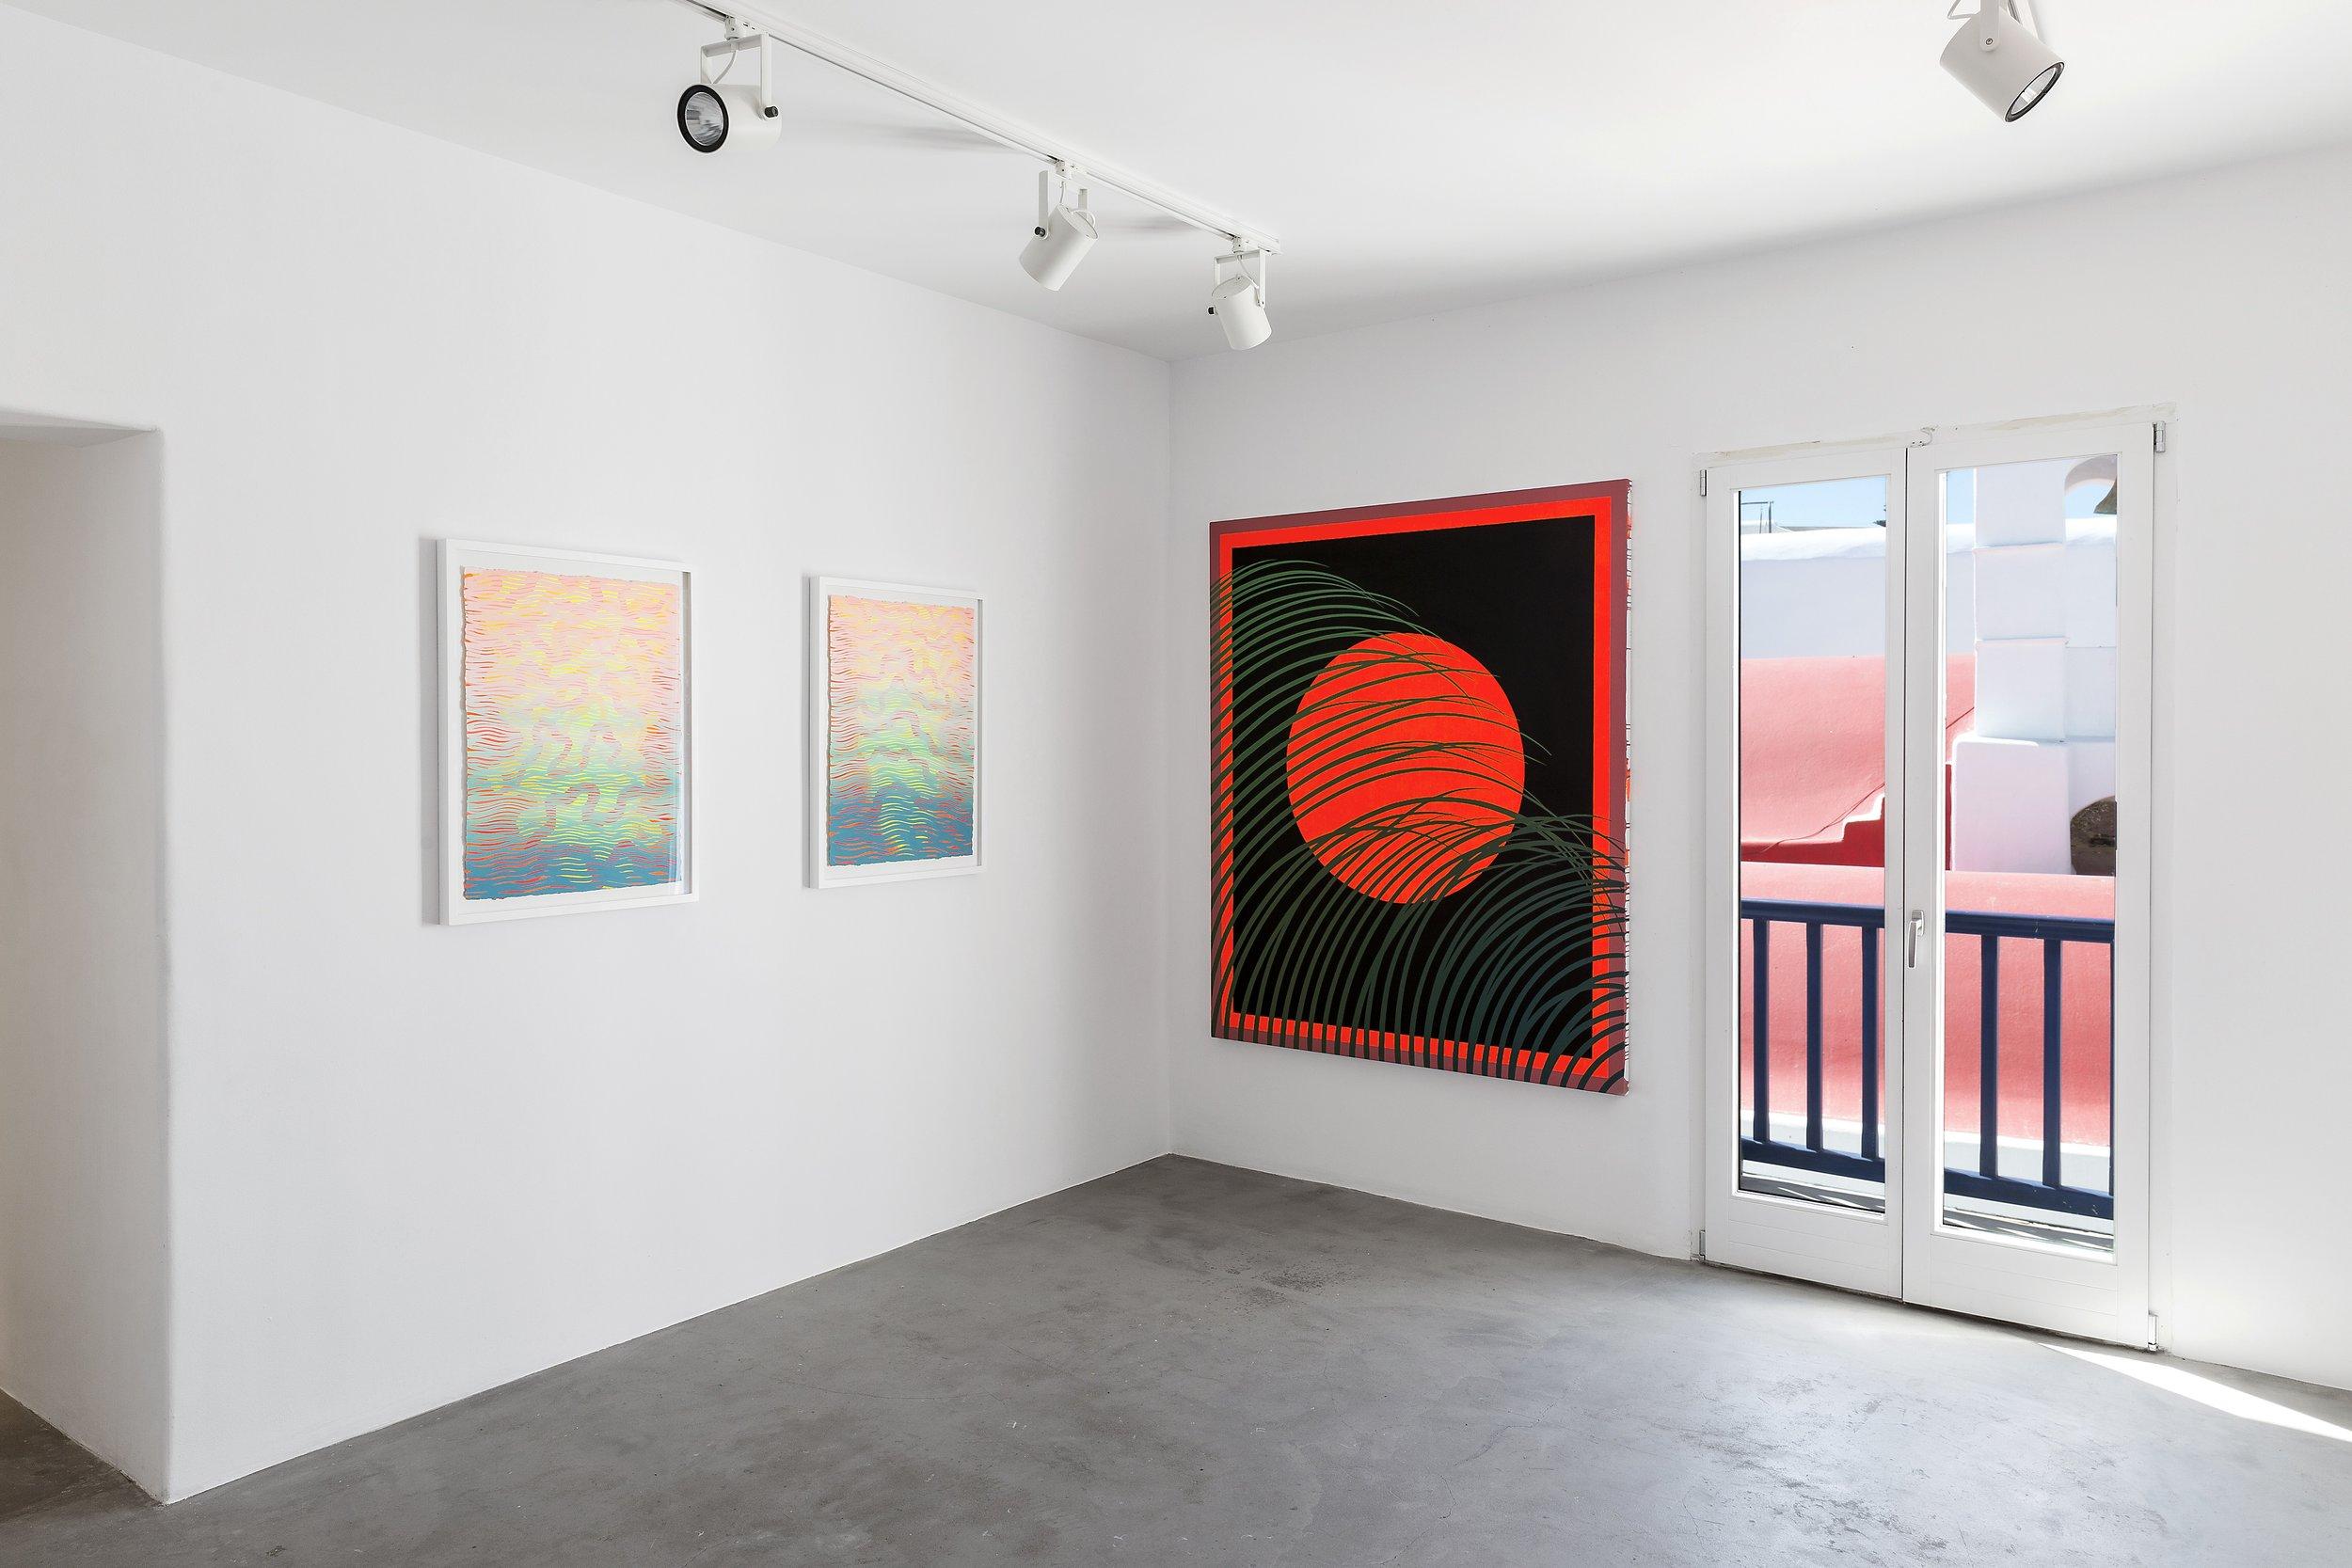 Sam Friedman, Days of Kindness, 2019. Installation view.